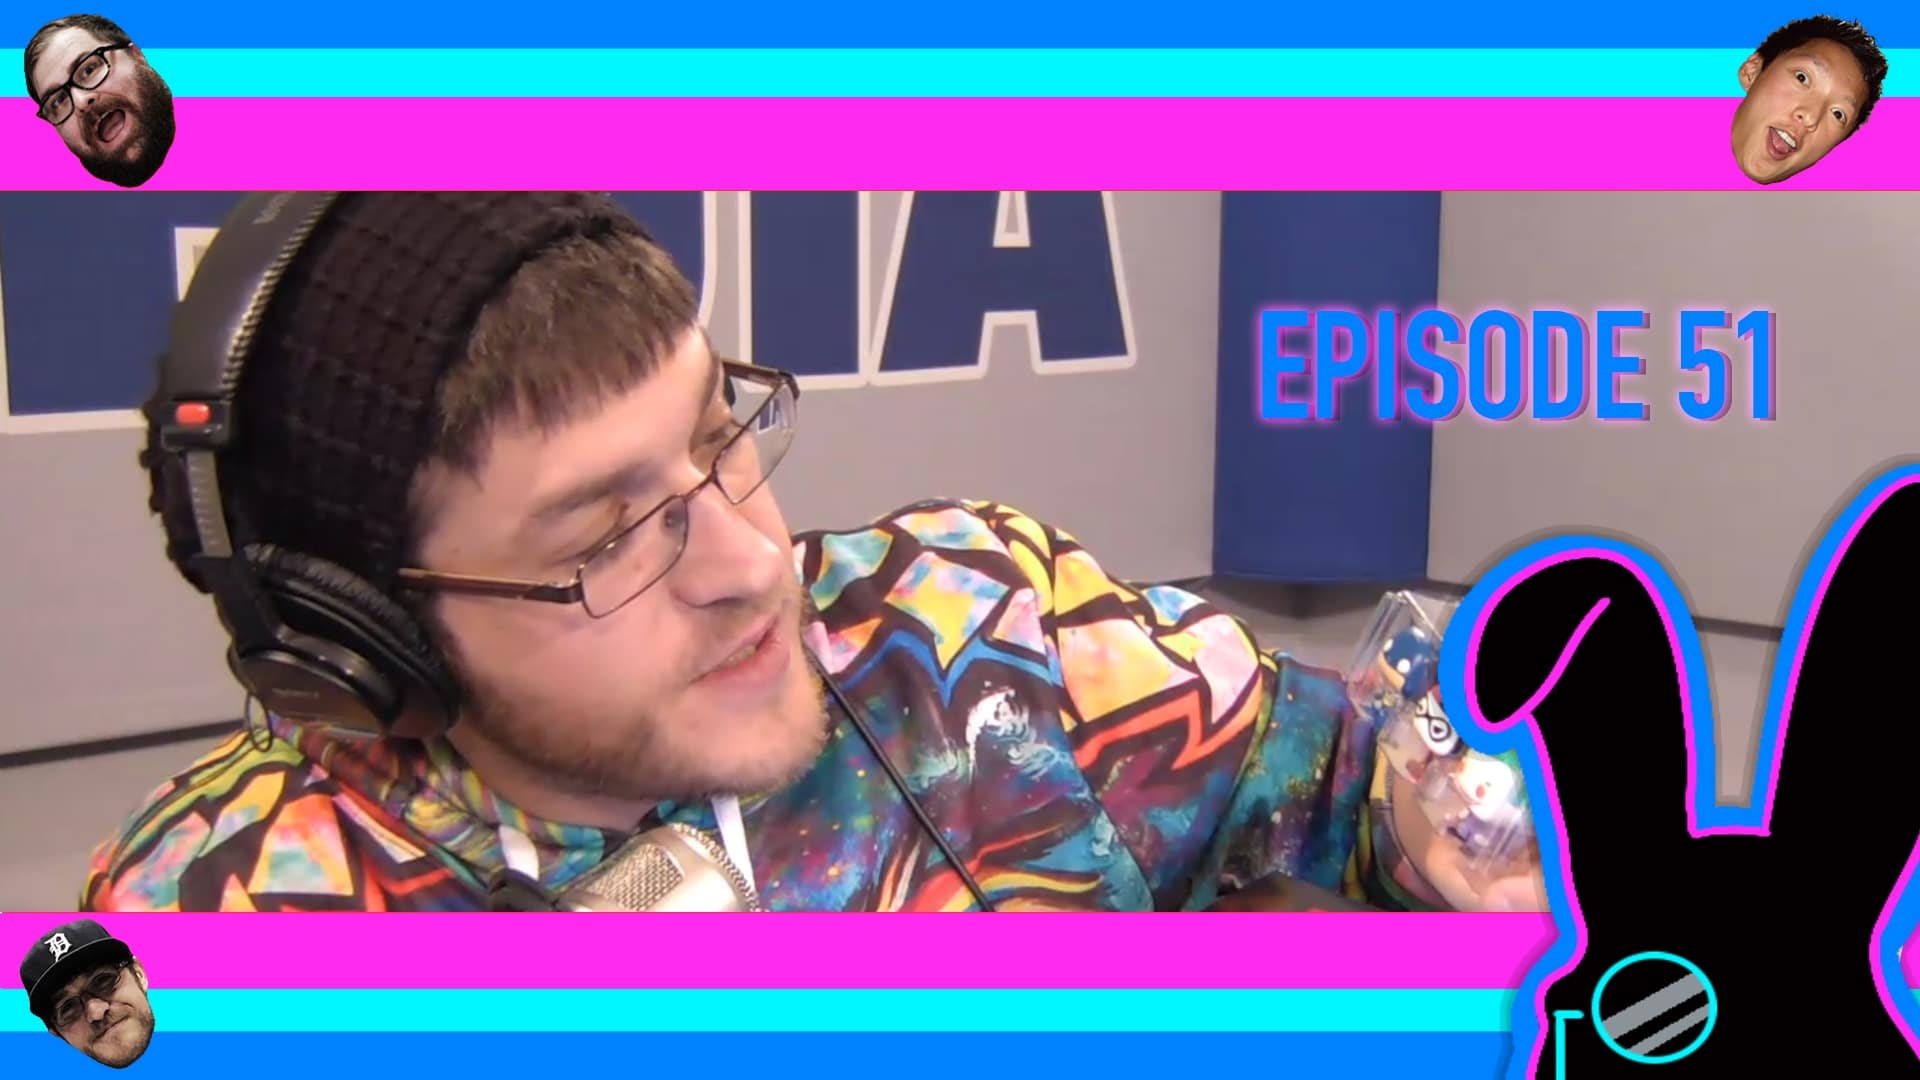 Geektainment Weekly - Episode 51